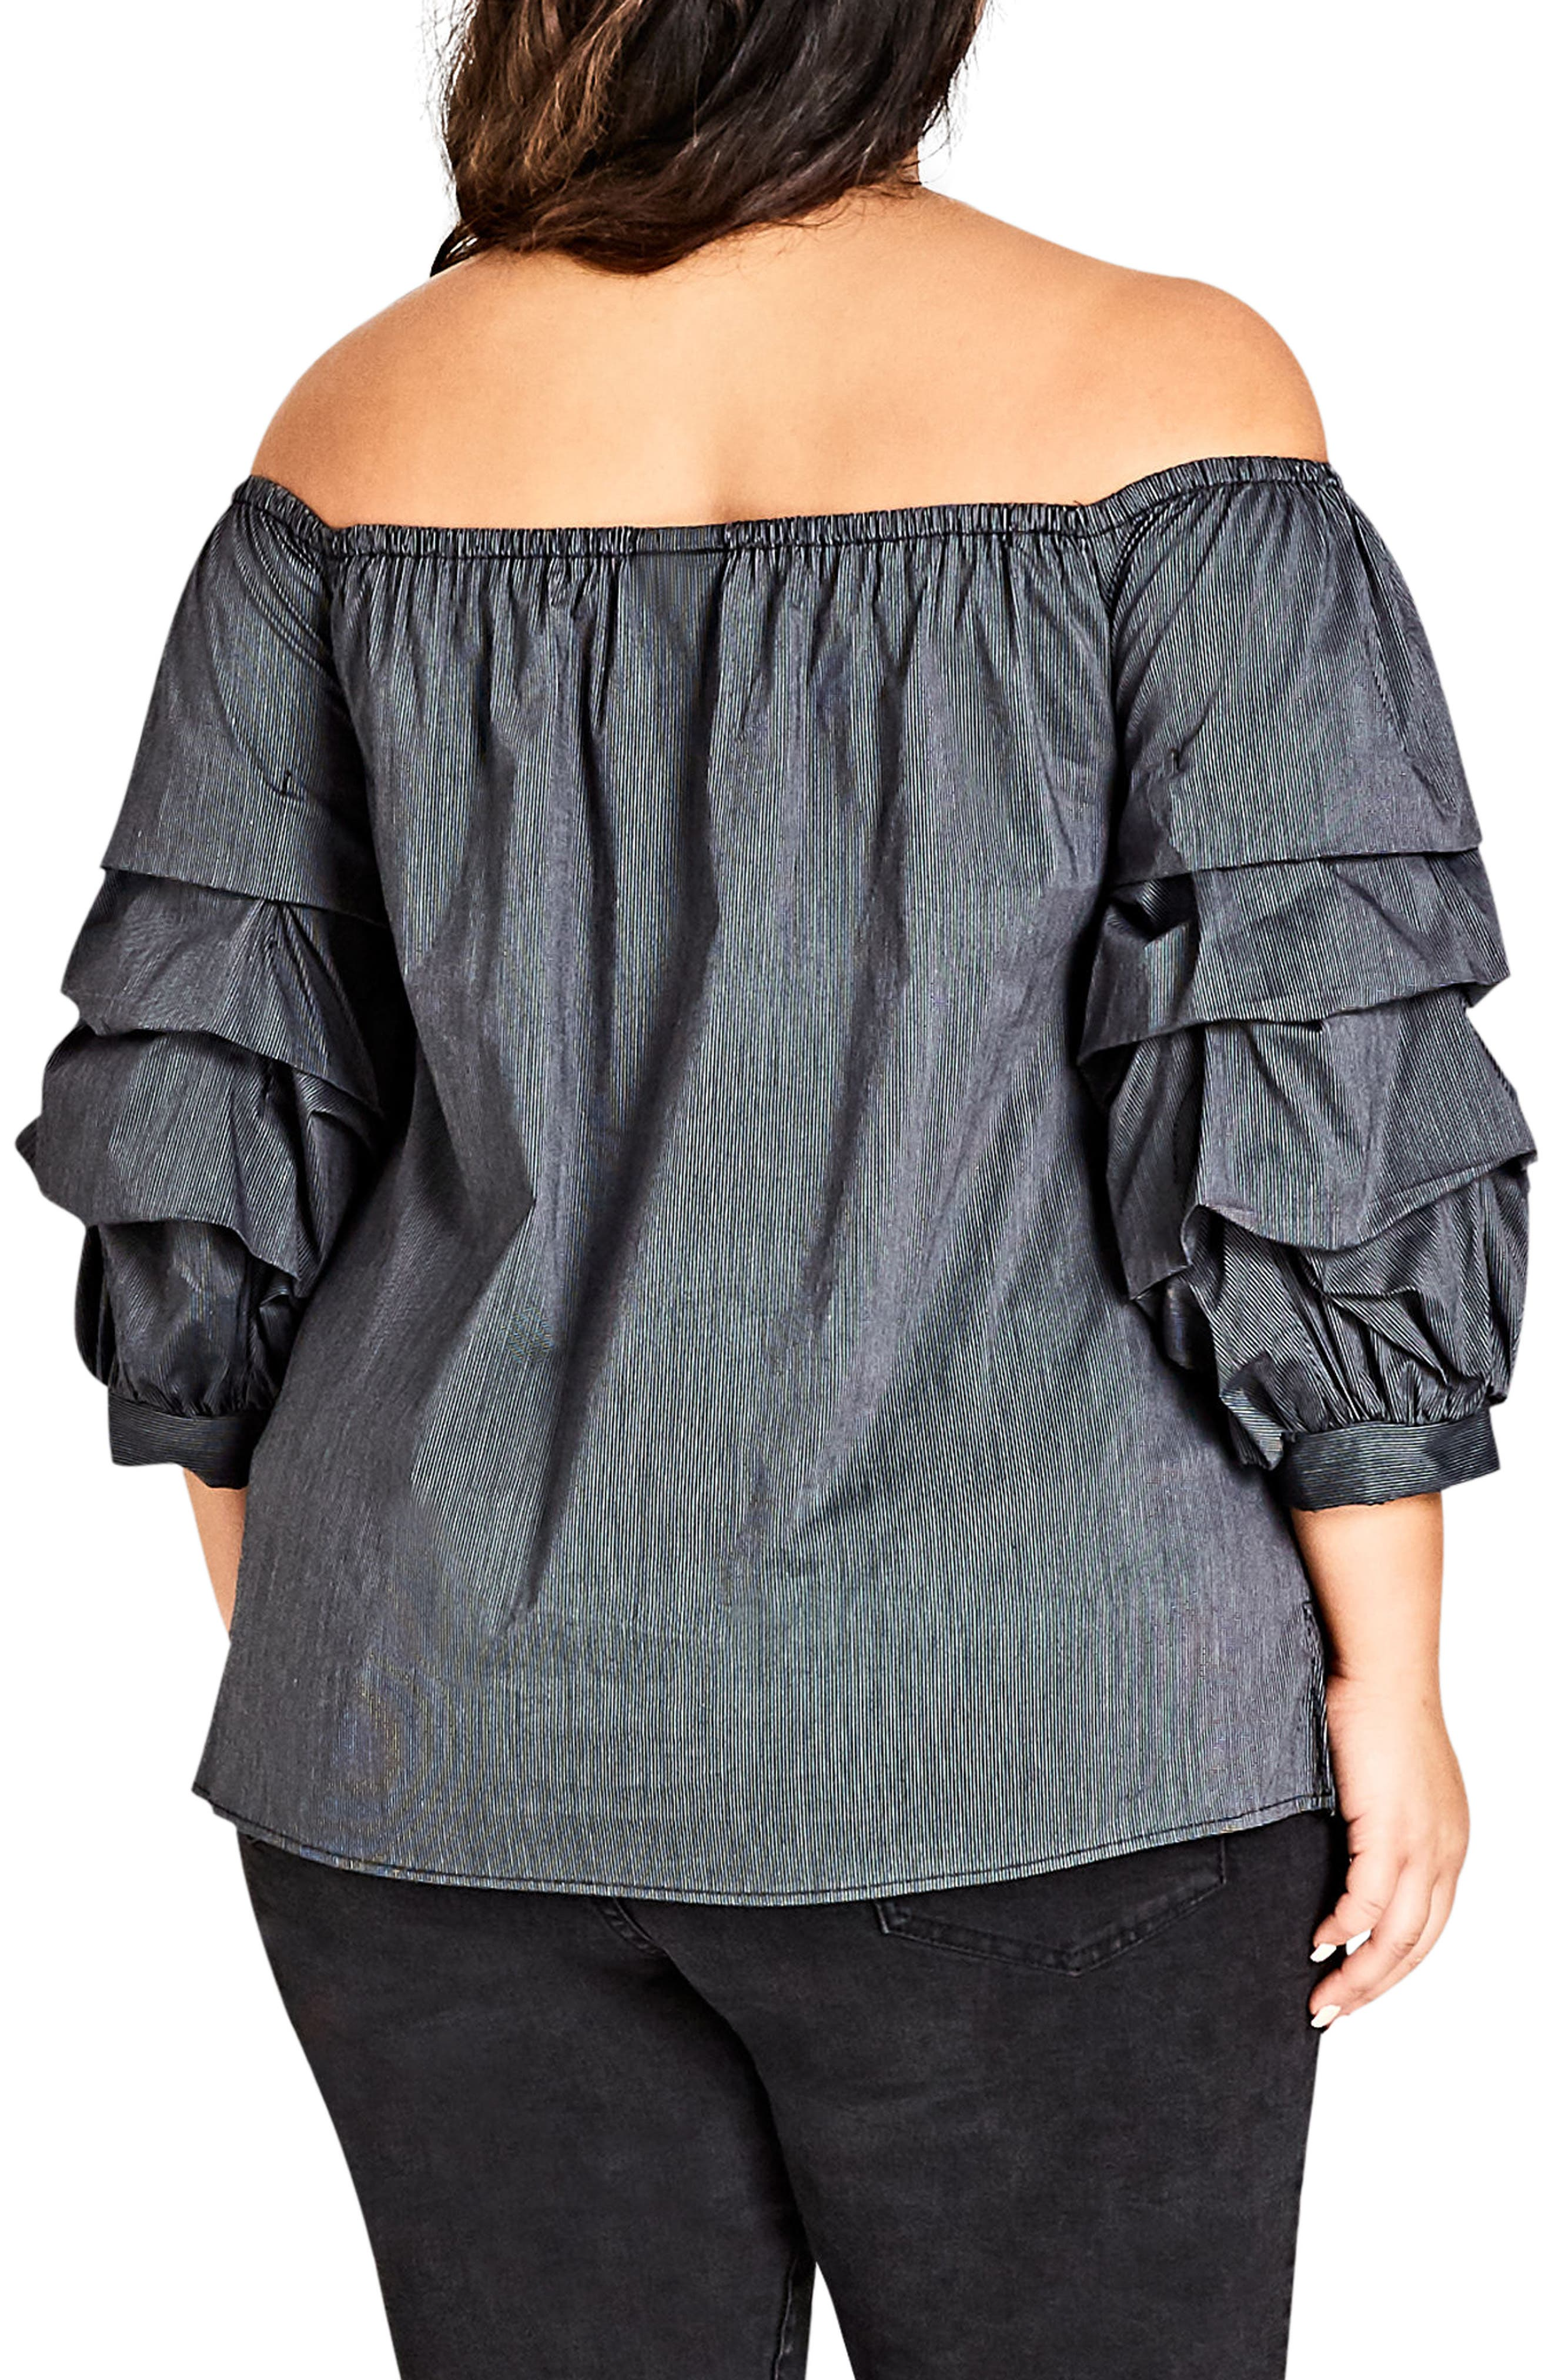 Fancy Sleeve Off the Shoulder Cotton Blend Top,                             Alternate thumbnail 2, color,                             Black Stripe